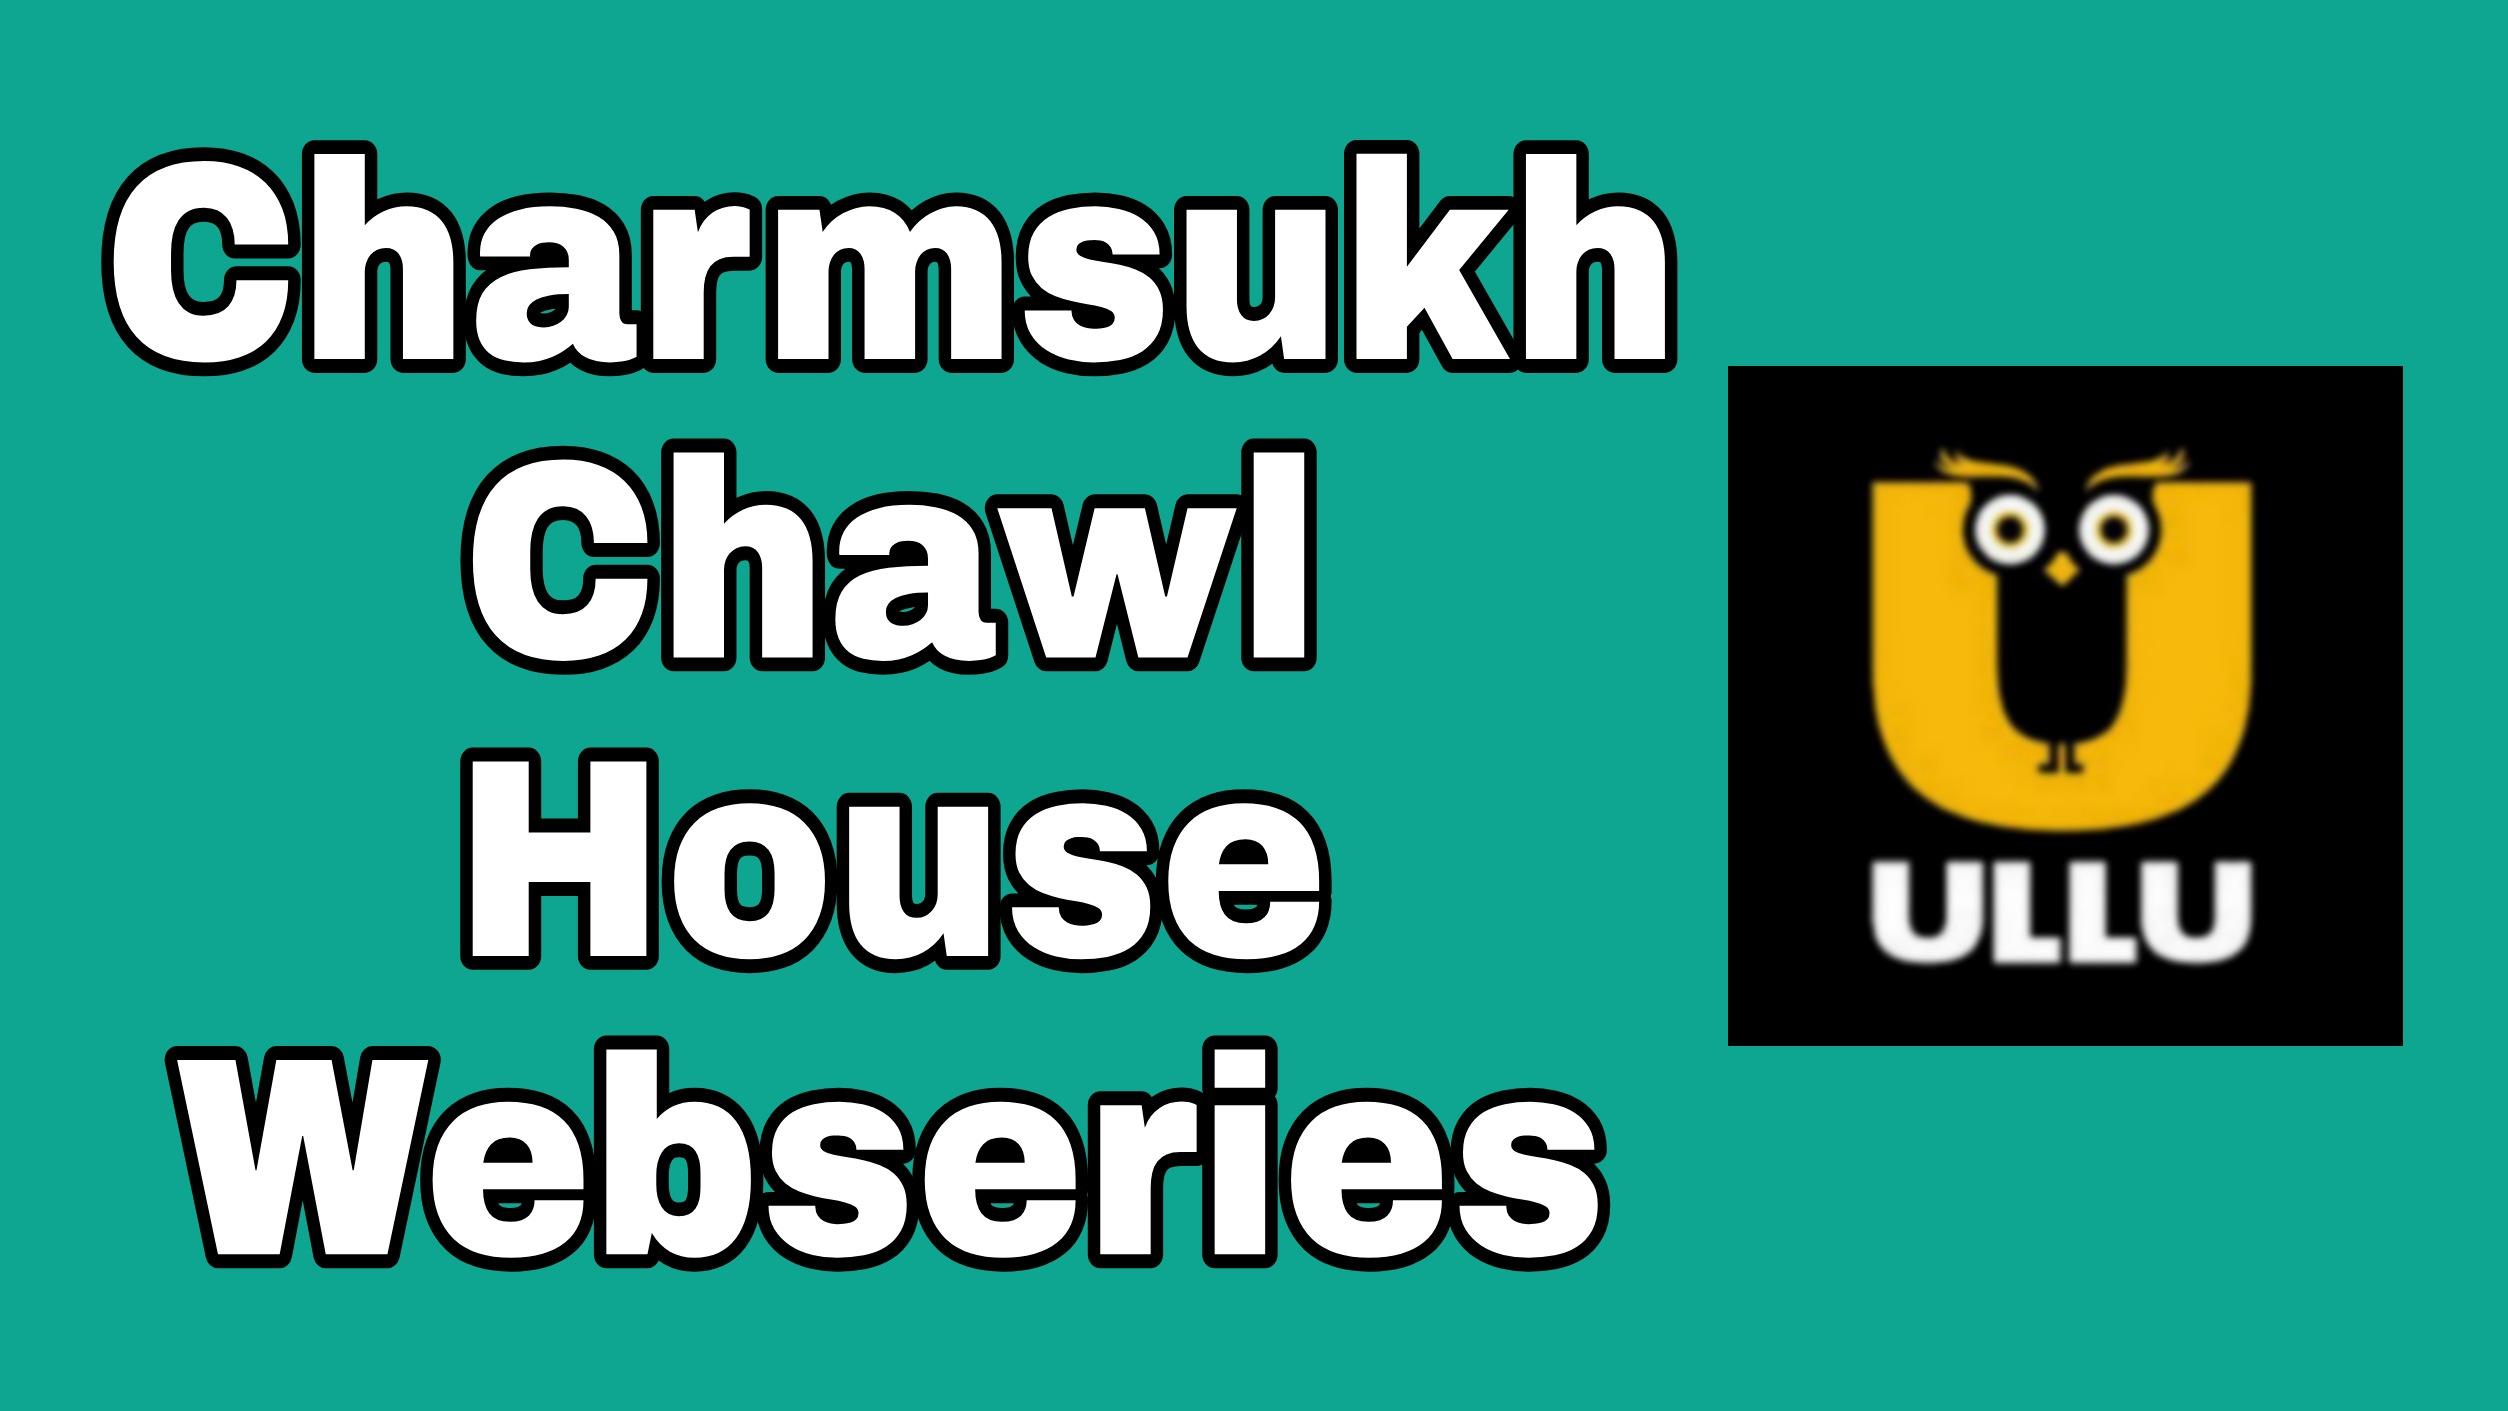 Charmsukh